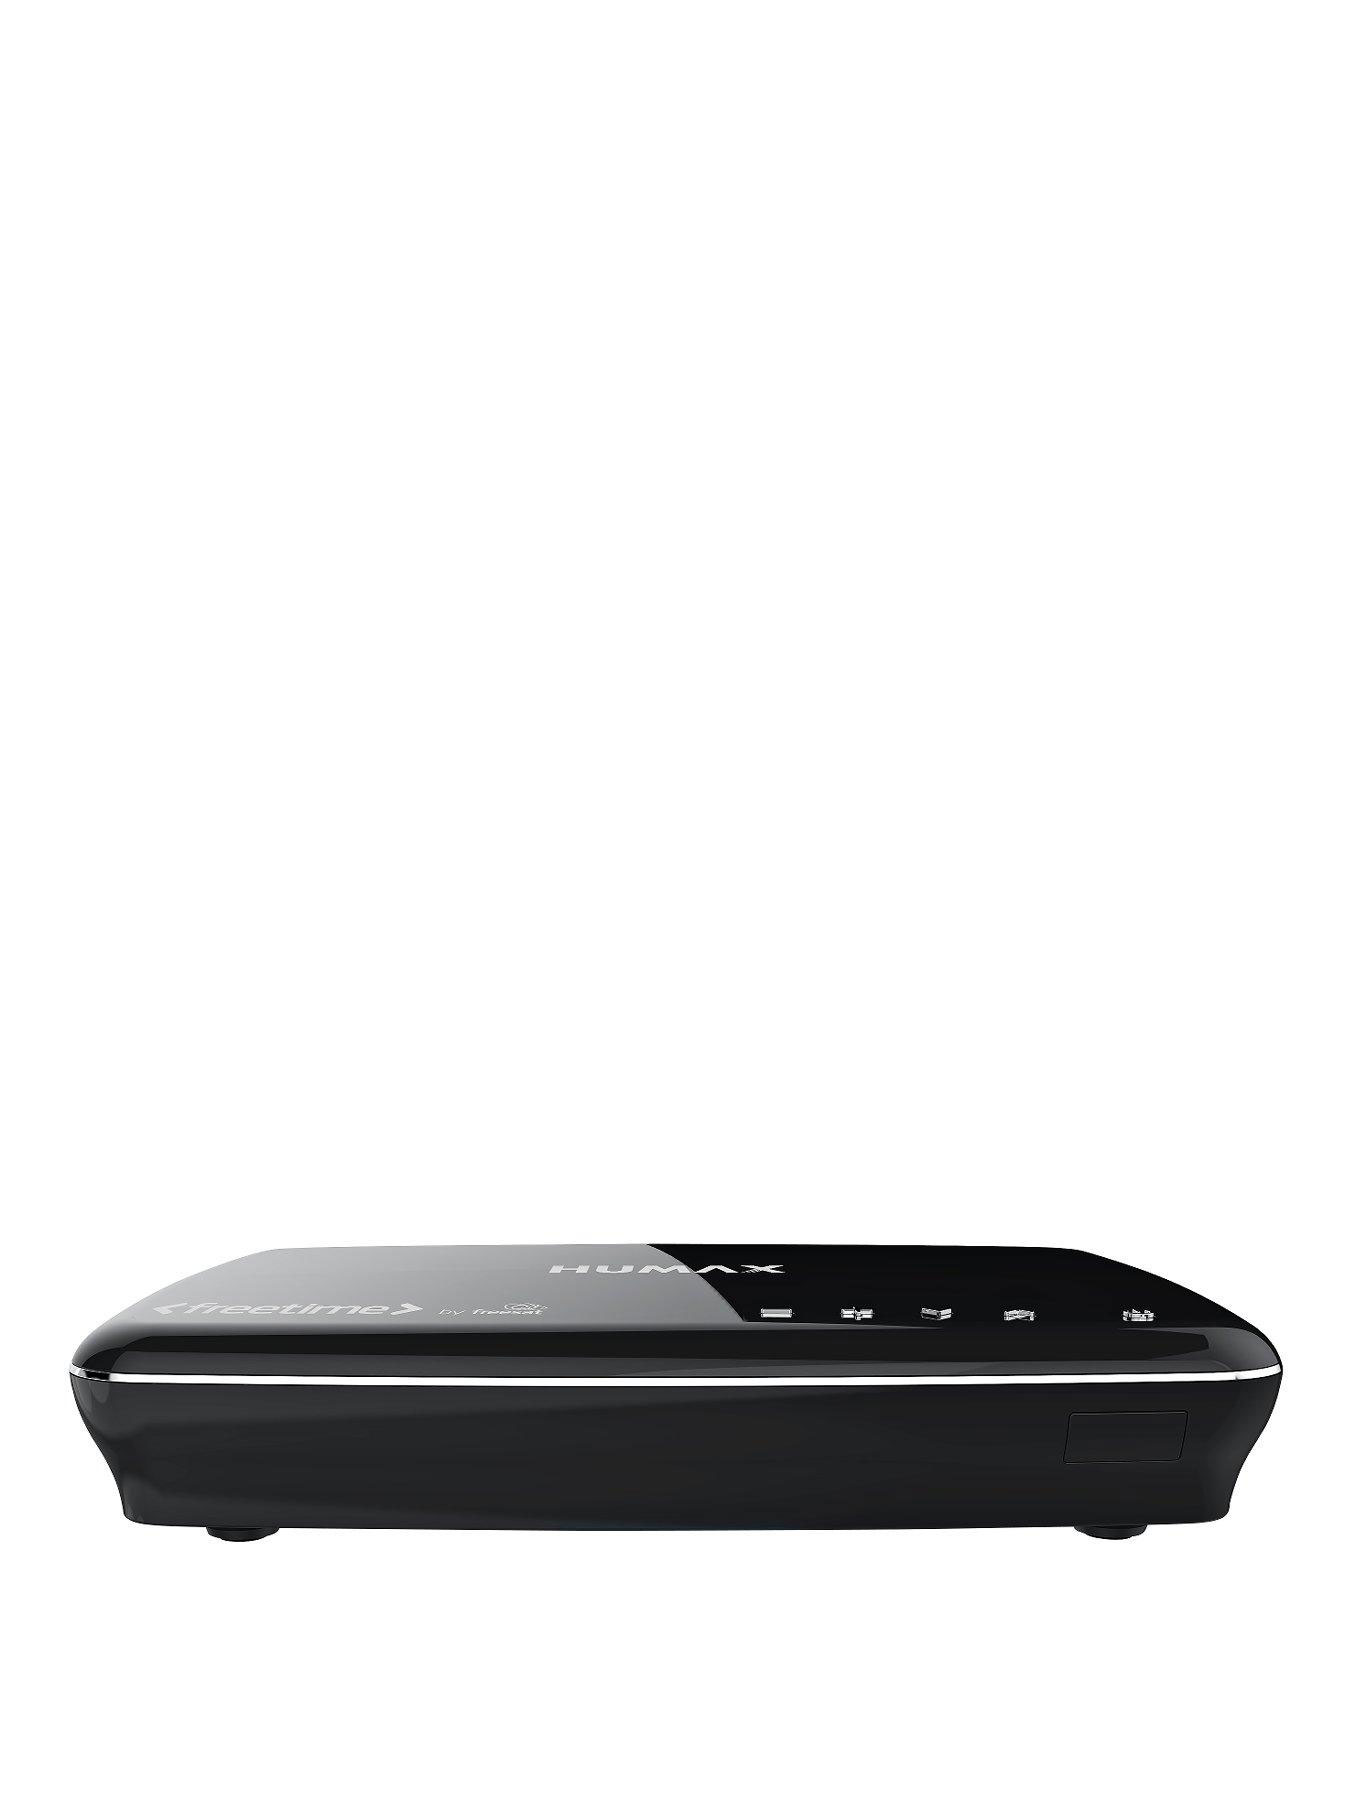 Humax HDR1100S 500GB